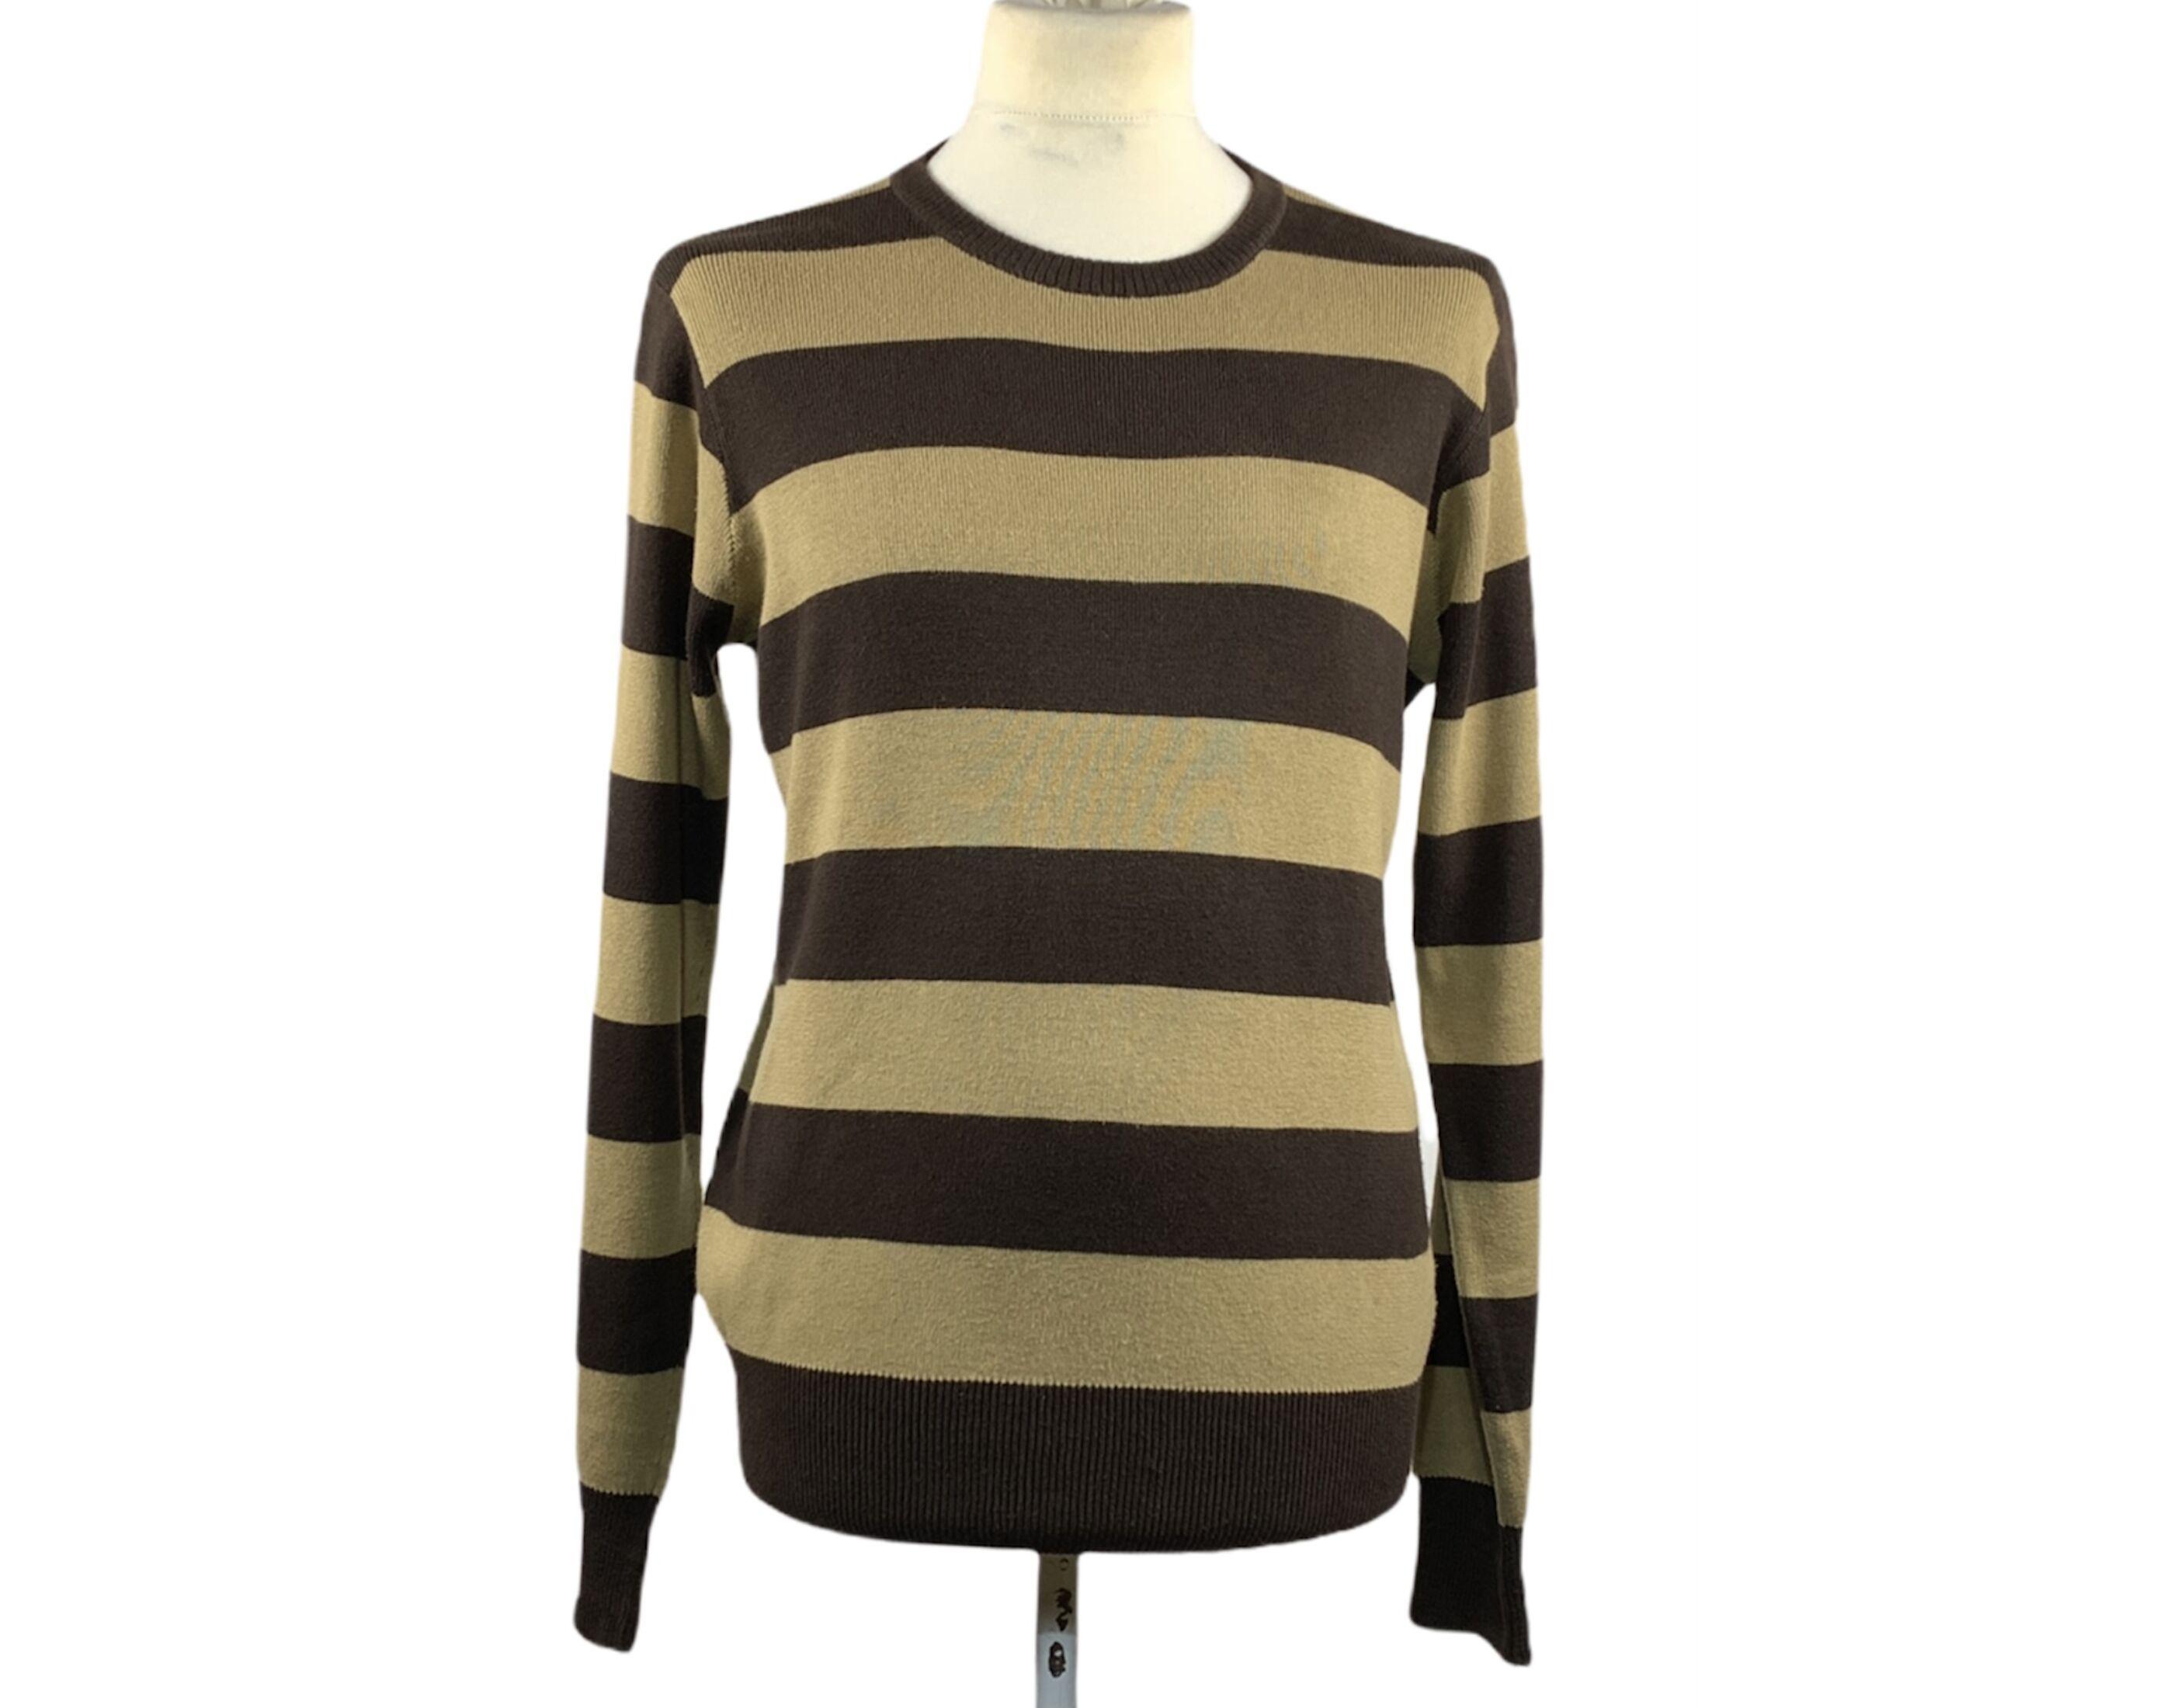 Carhartt pulóver (M)